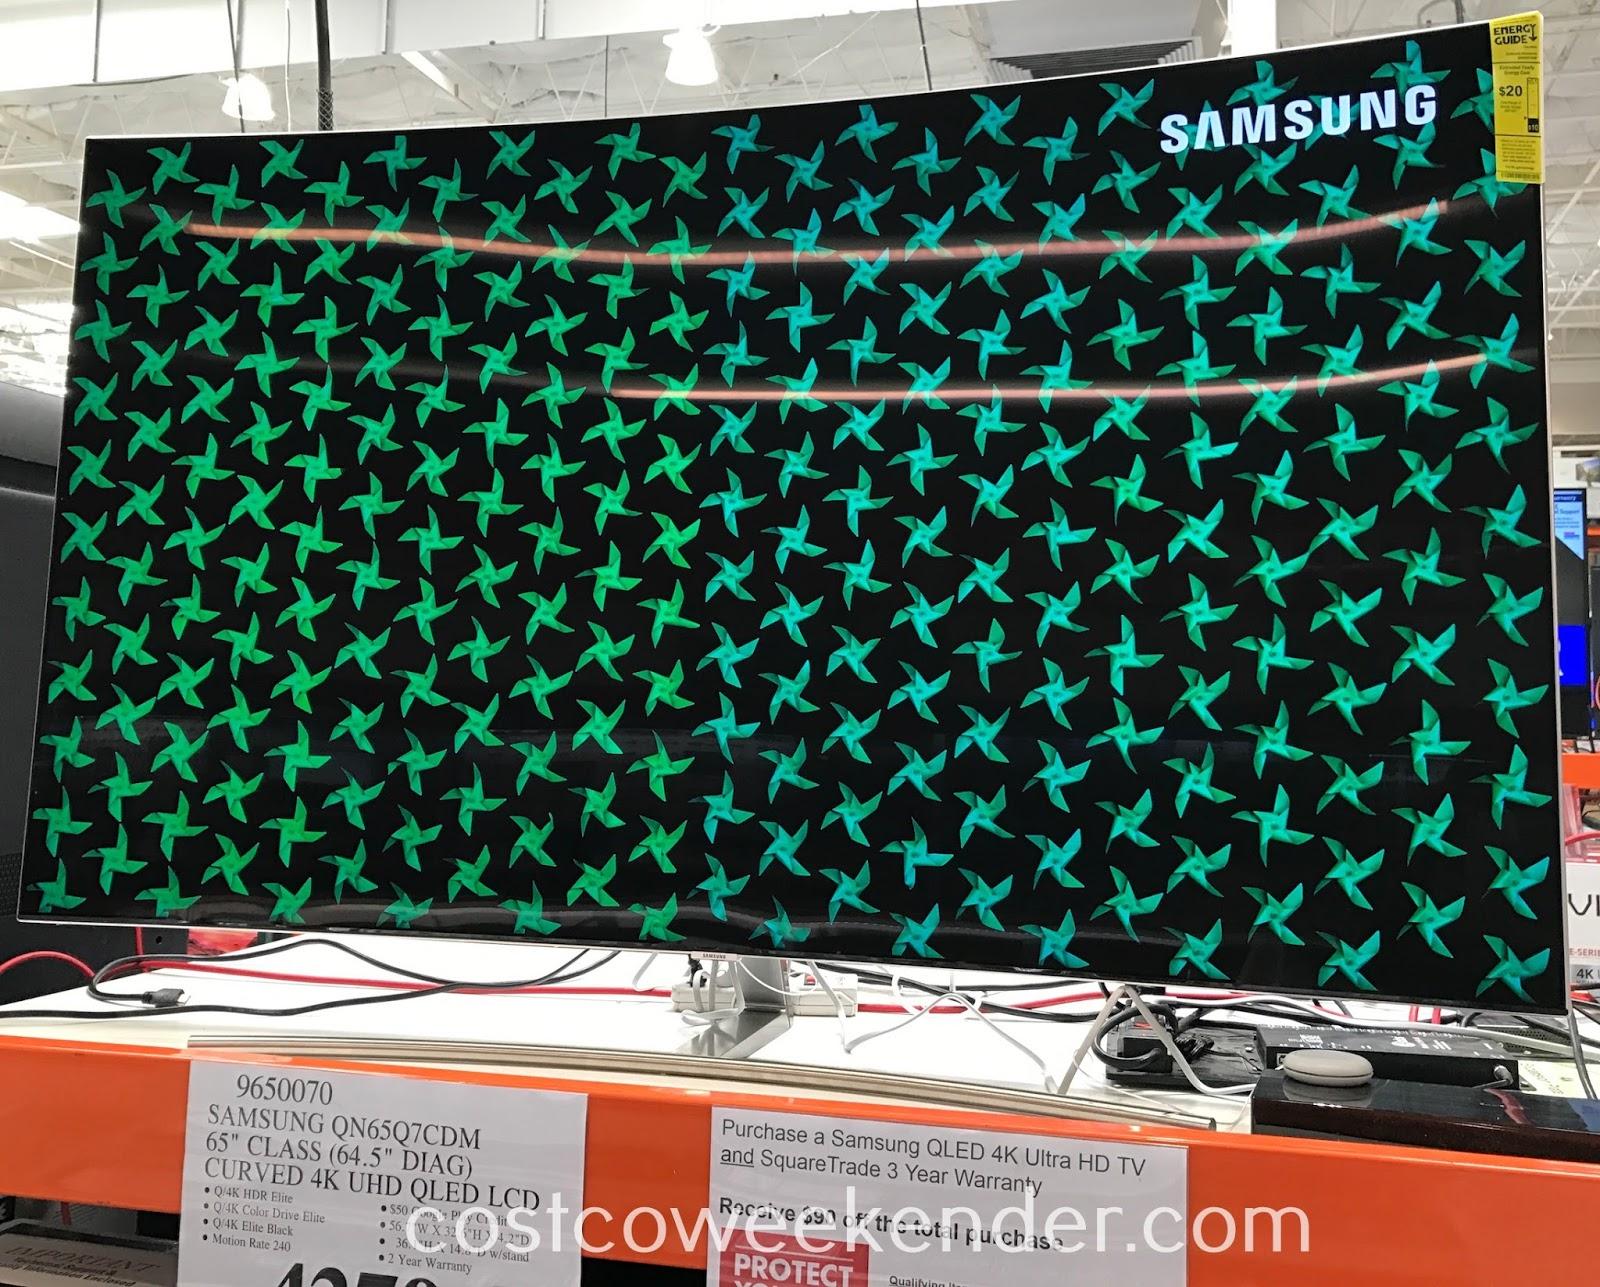 "Samsung QN65Q7CDM 65"" Curved 4K UHD QLED TV | Costco Weekender"